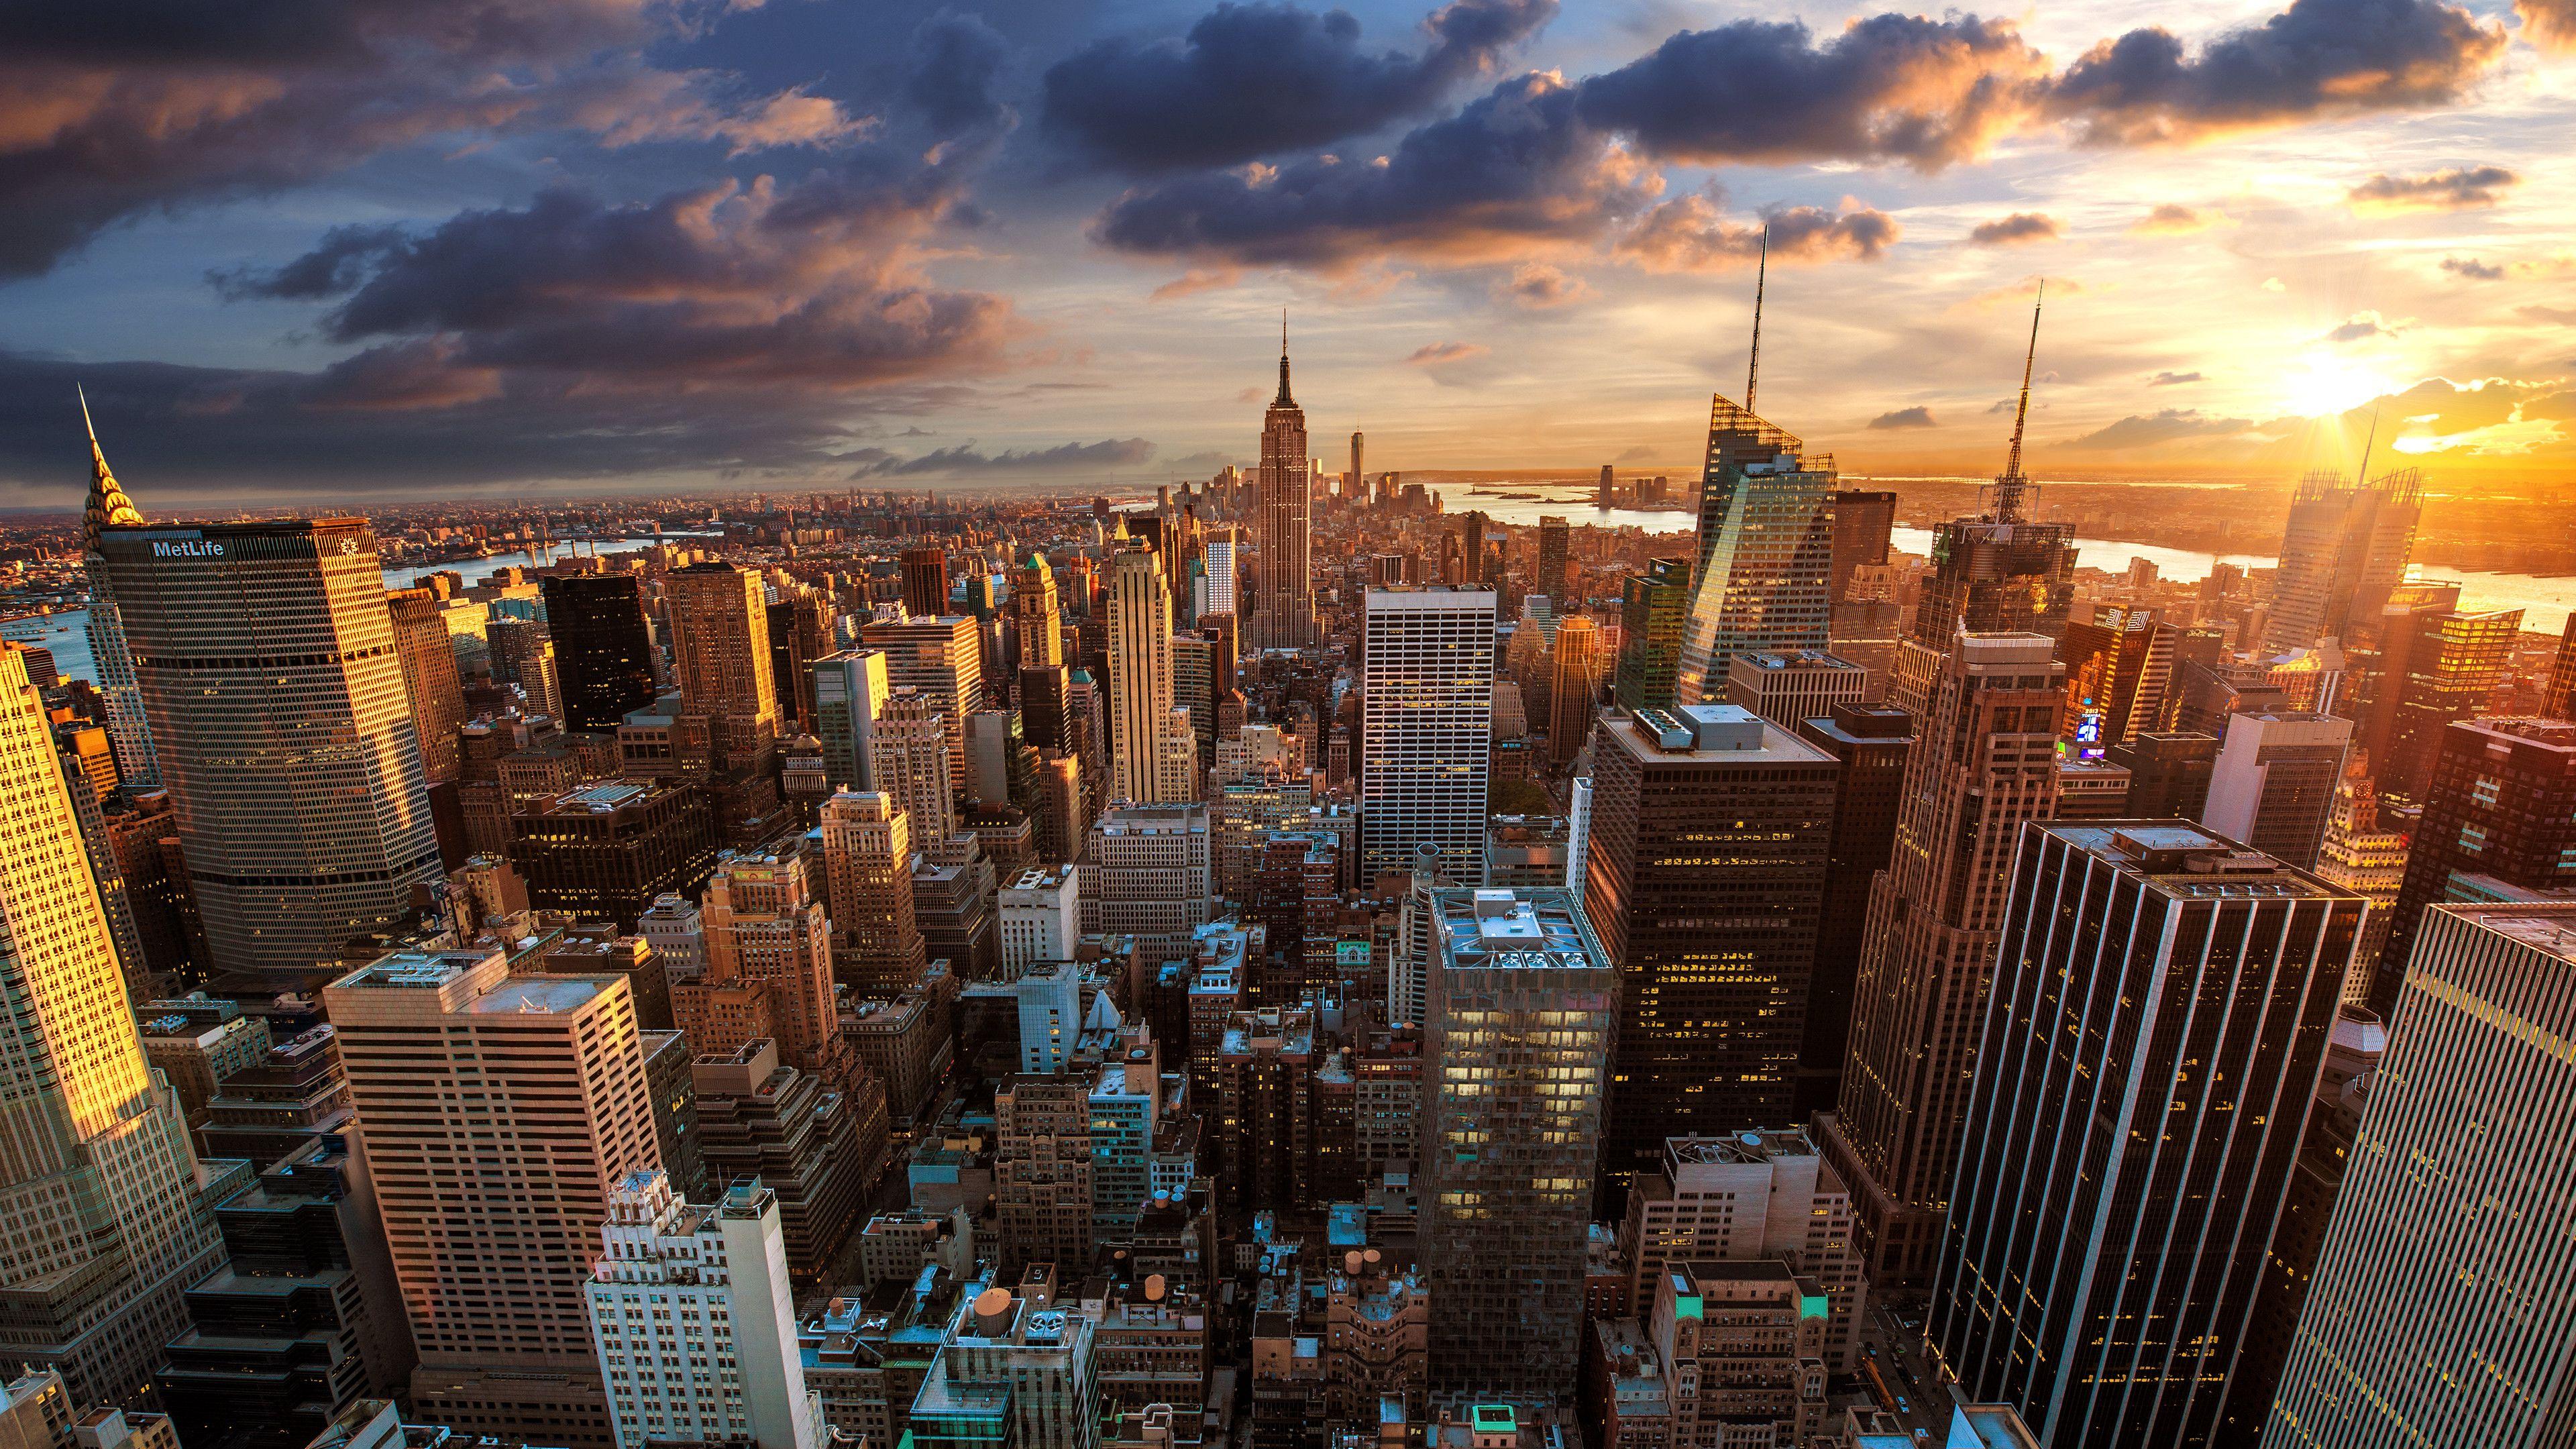 84 4k Desktop Wallpapers On Wallpaperplay New York City Background New York Wallpaper City Wallpaper